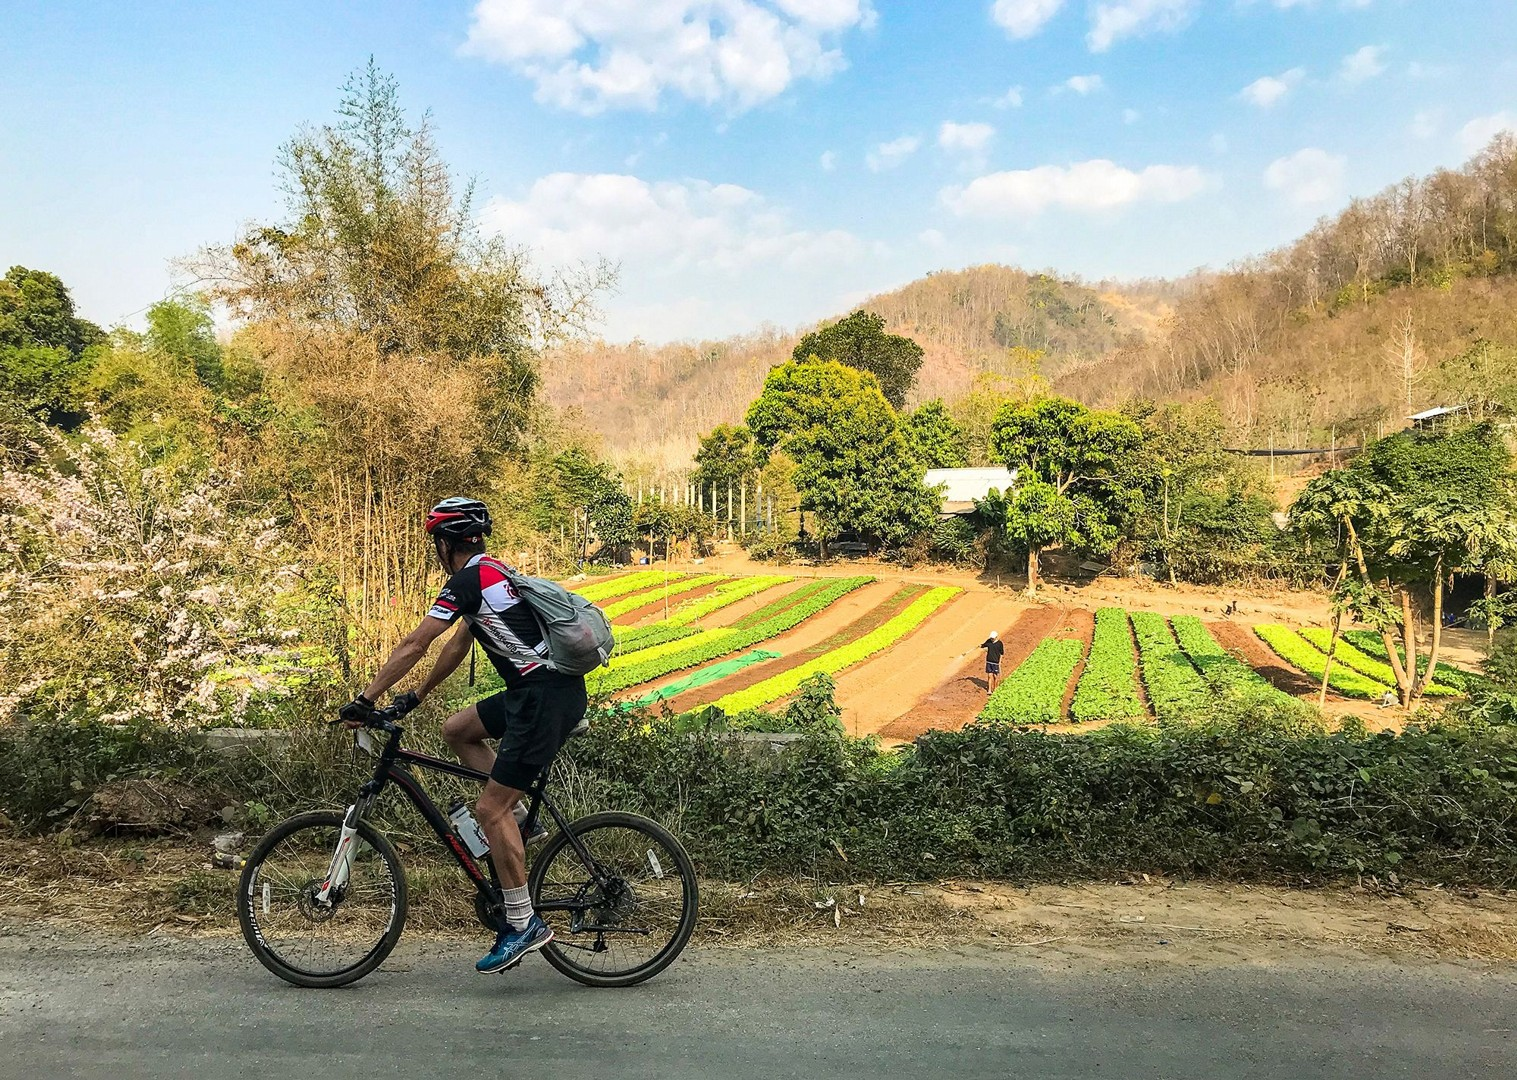 IMG_5328.jpg - Laos - Hidden Treasures - Cycling Adventures